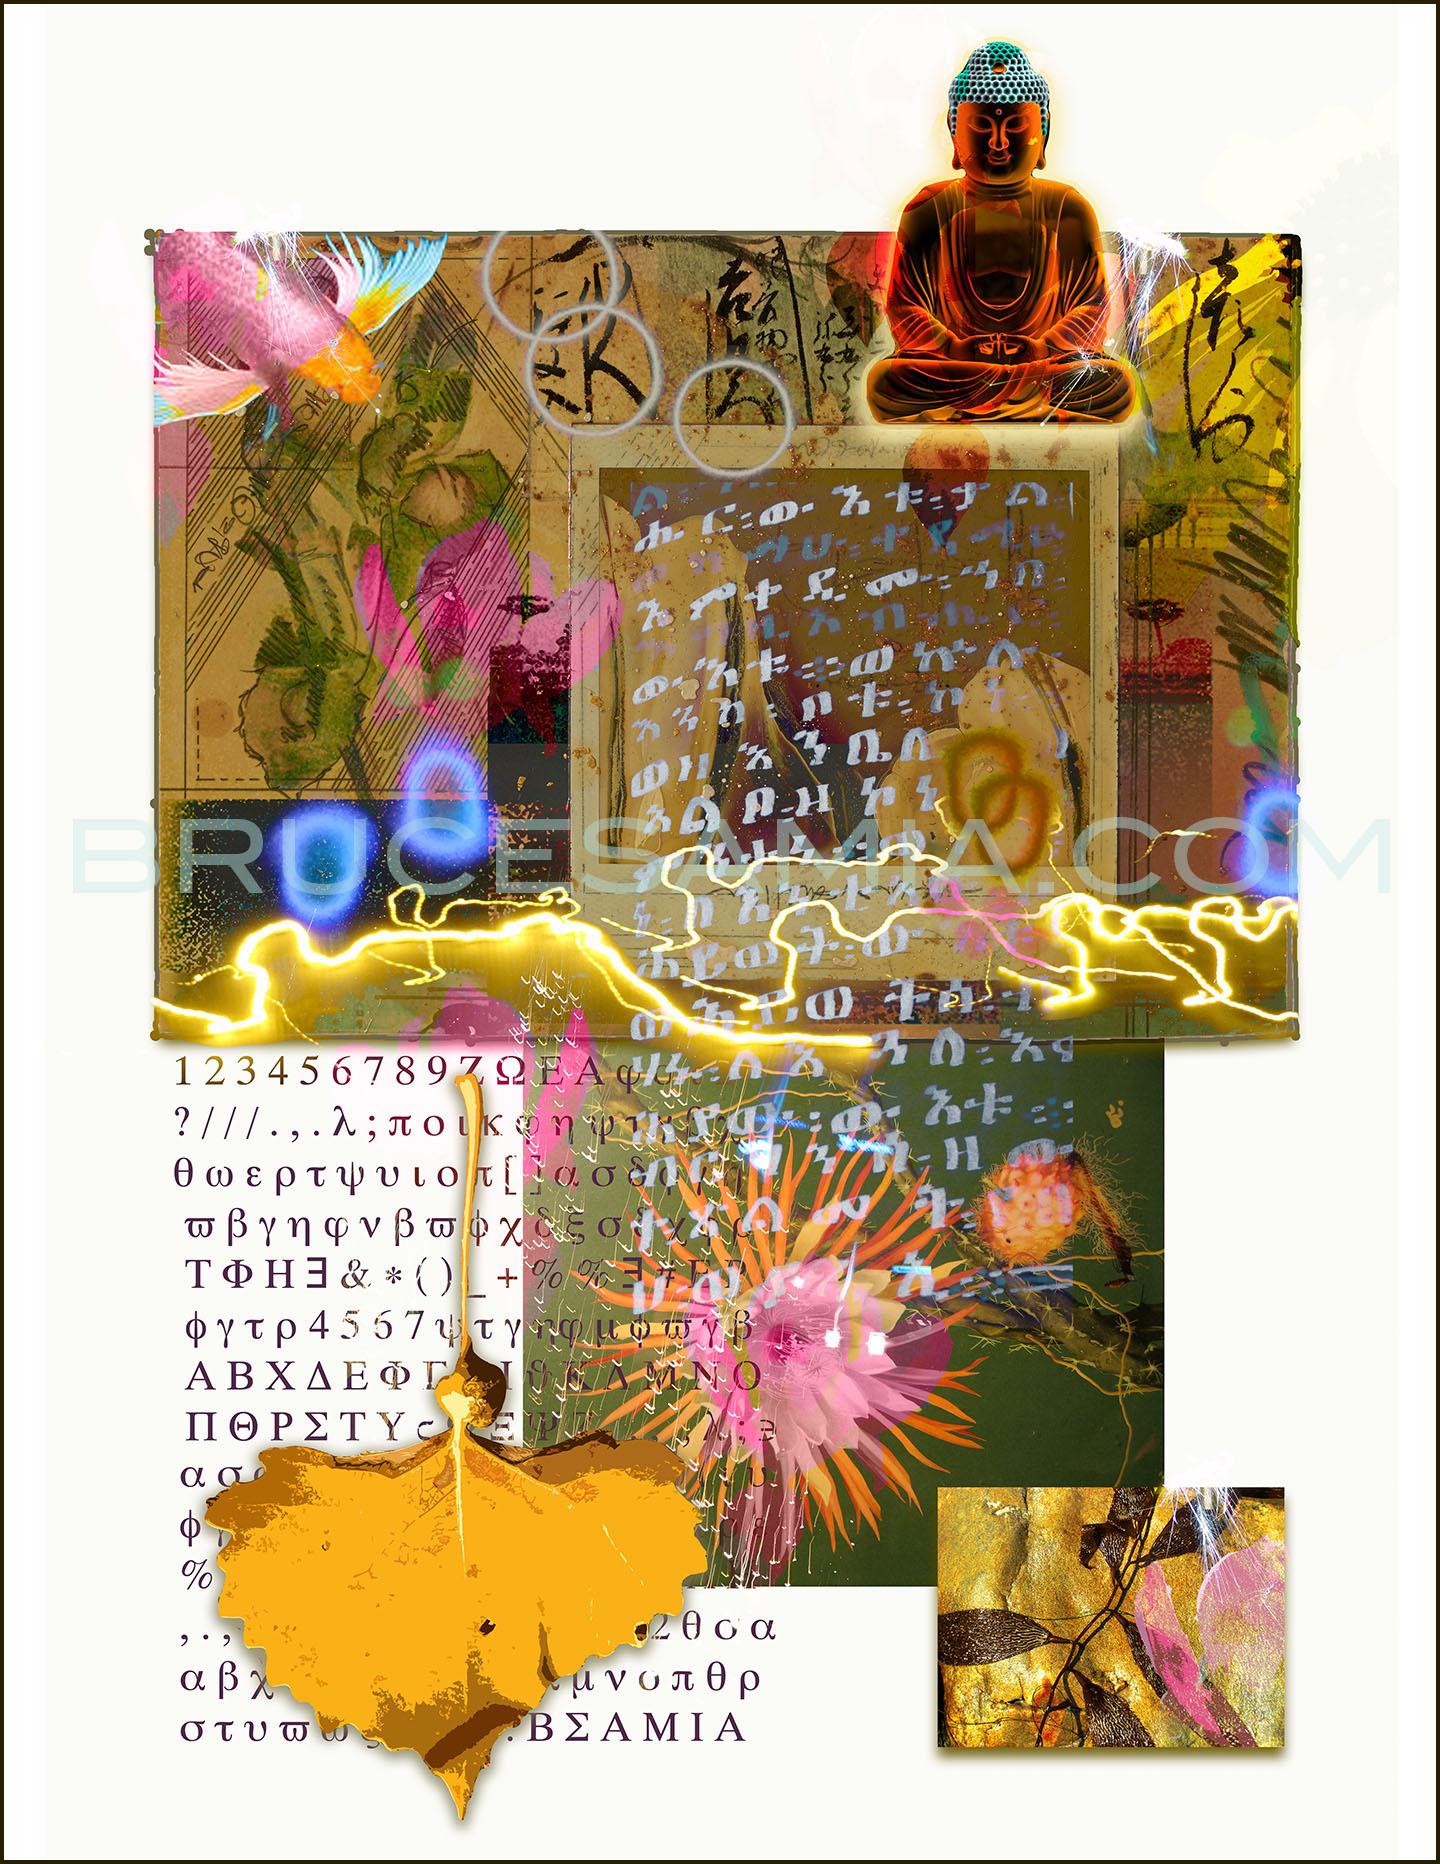 2. BUDDHA WRITINGS